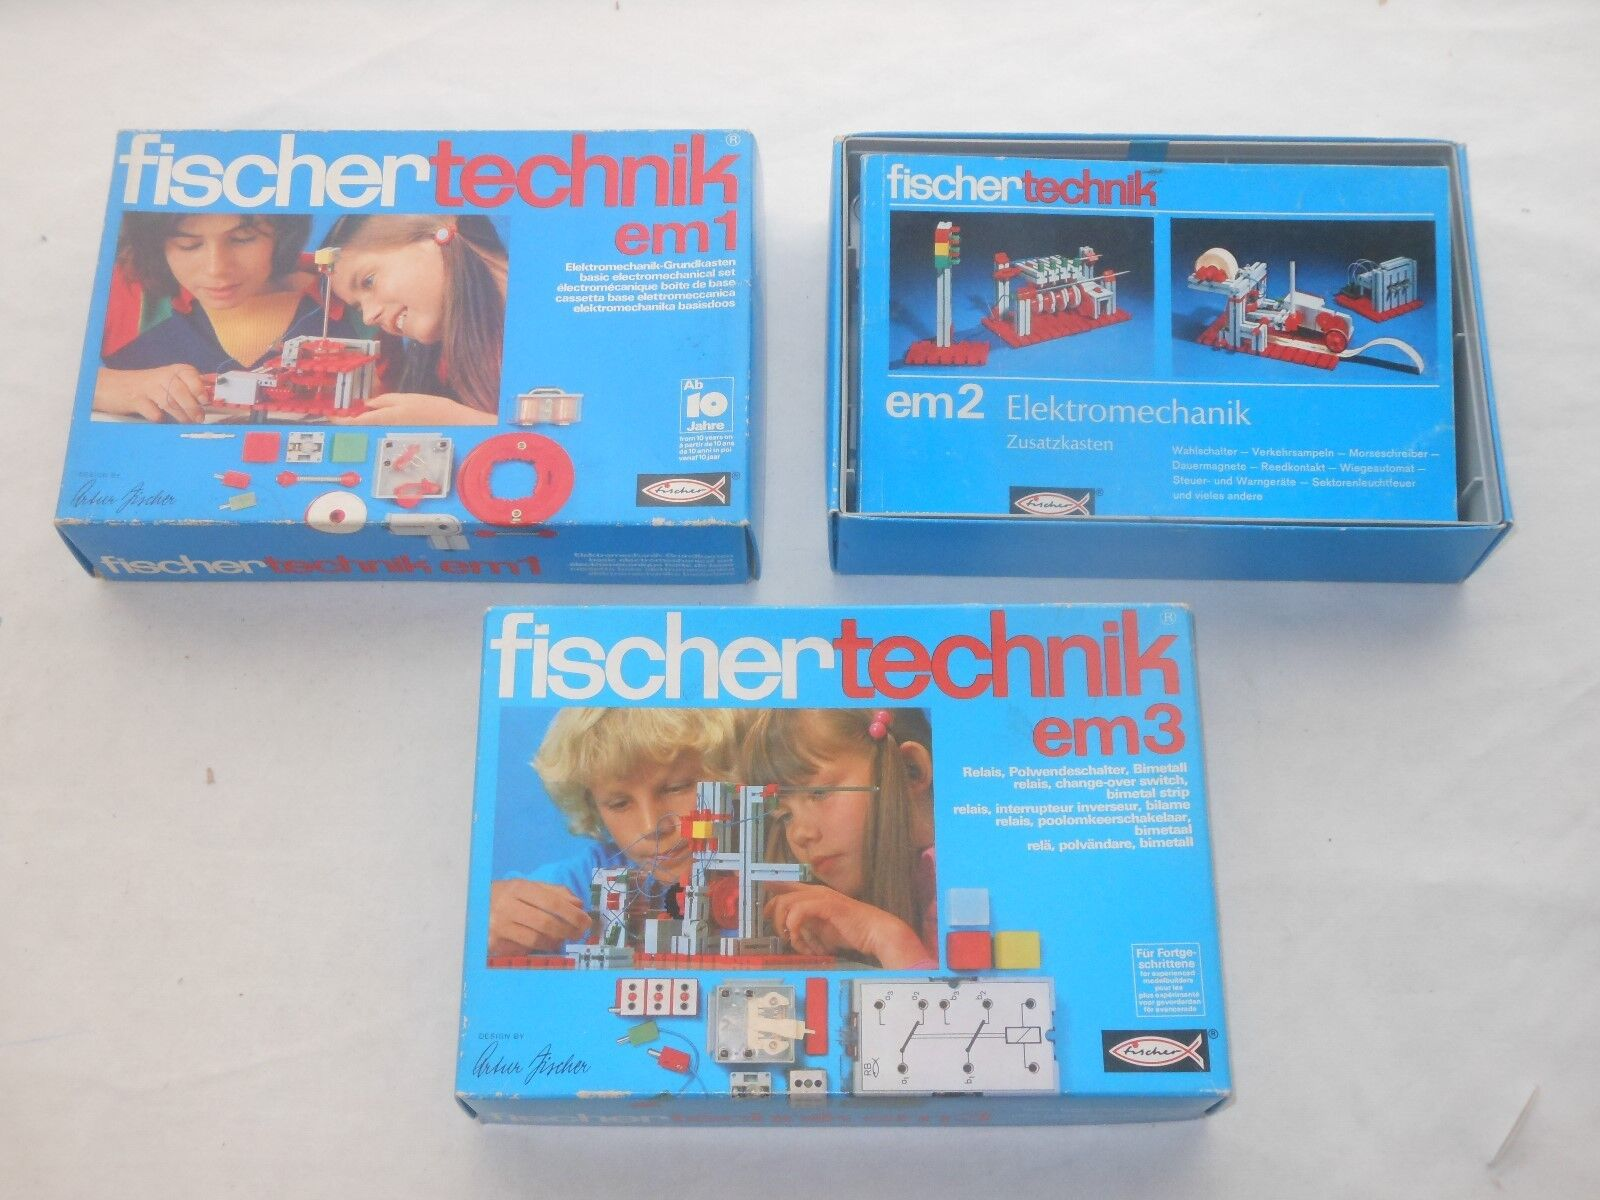 Fischertechnik Lot Sets - Elektromechanik -em1+em2+em3 - Emb.orig - L38